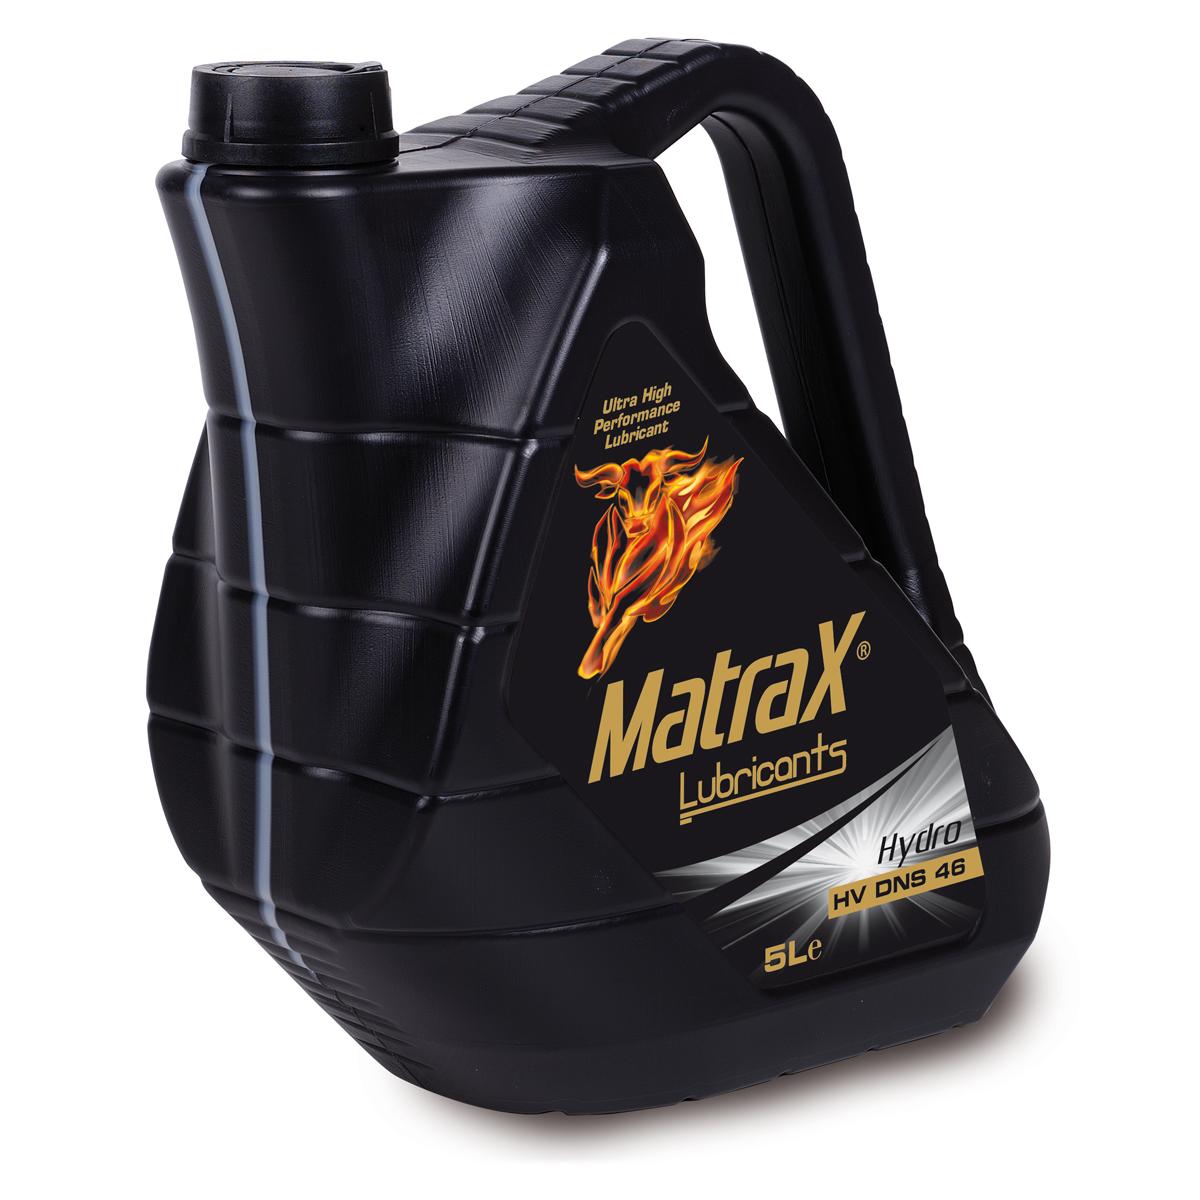 matrax-lubricants-hydro-hv-dns-46-5l